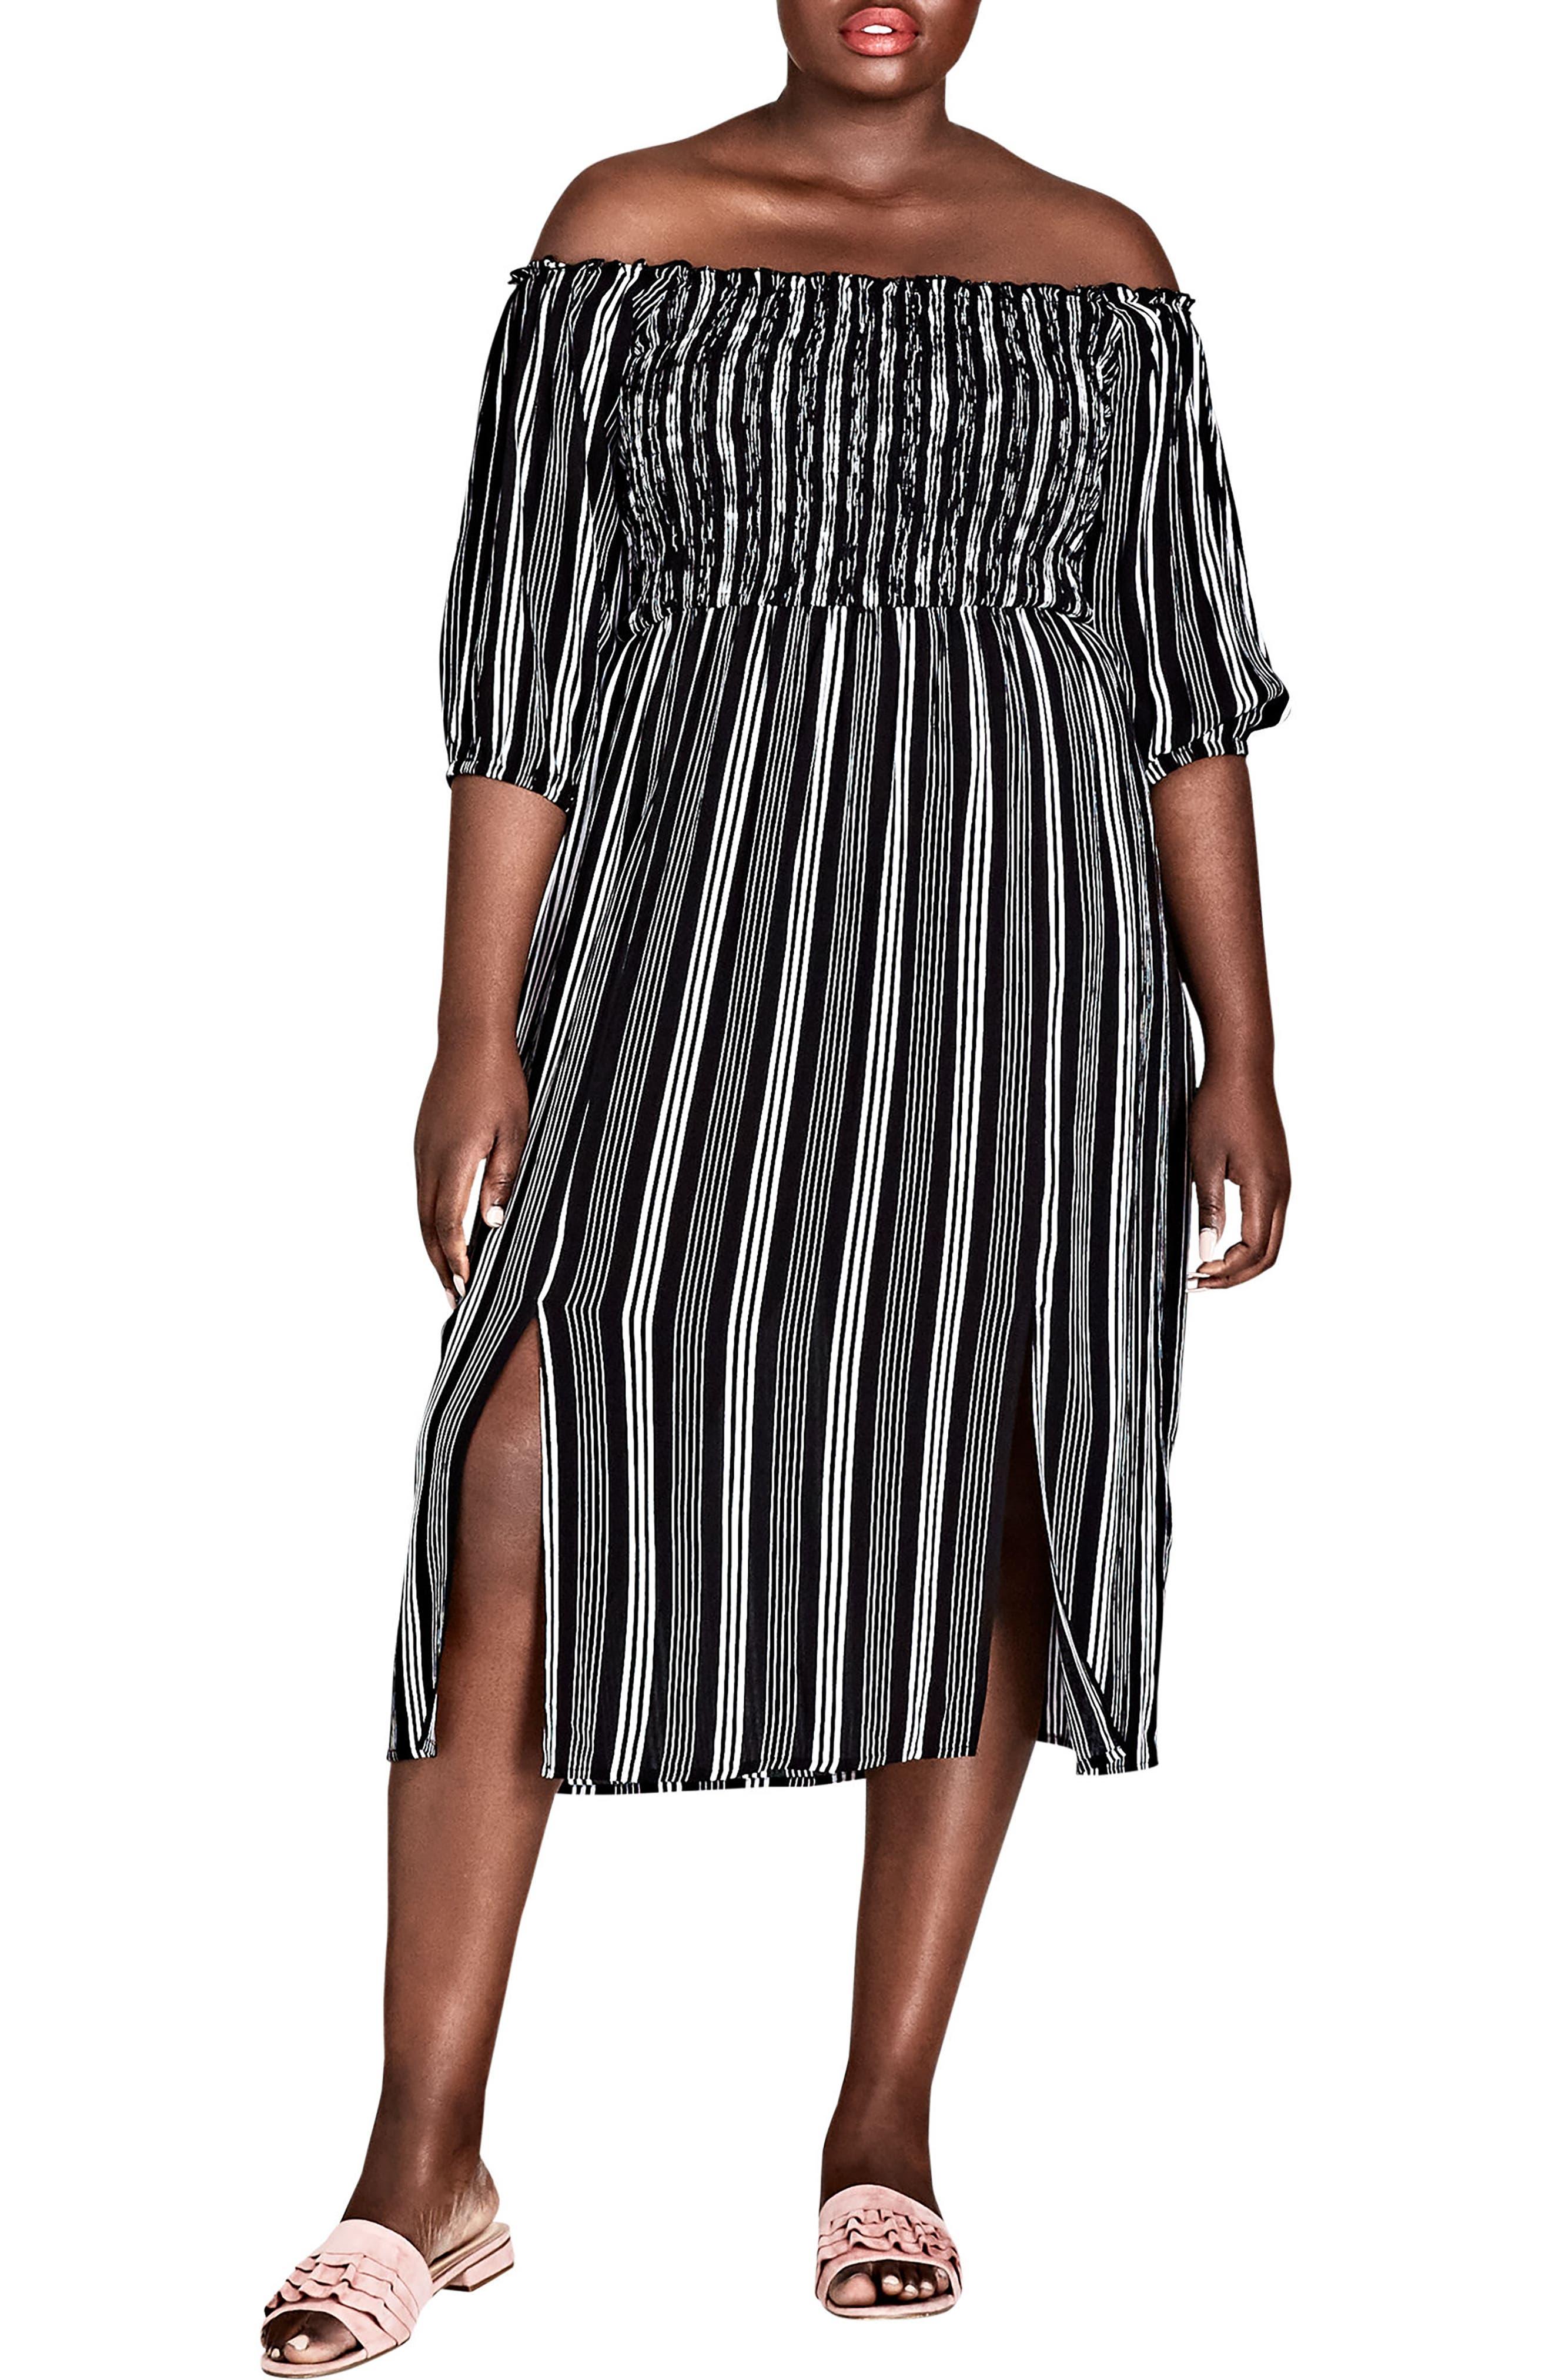 Stripe Play Off the Shoulder Midi Dress,                         Main,                         color, STRIPE PLAY